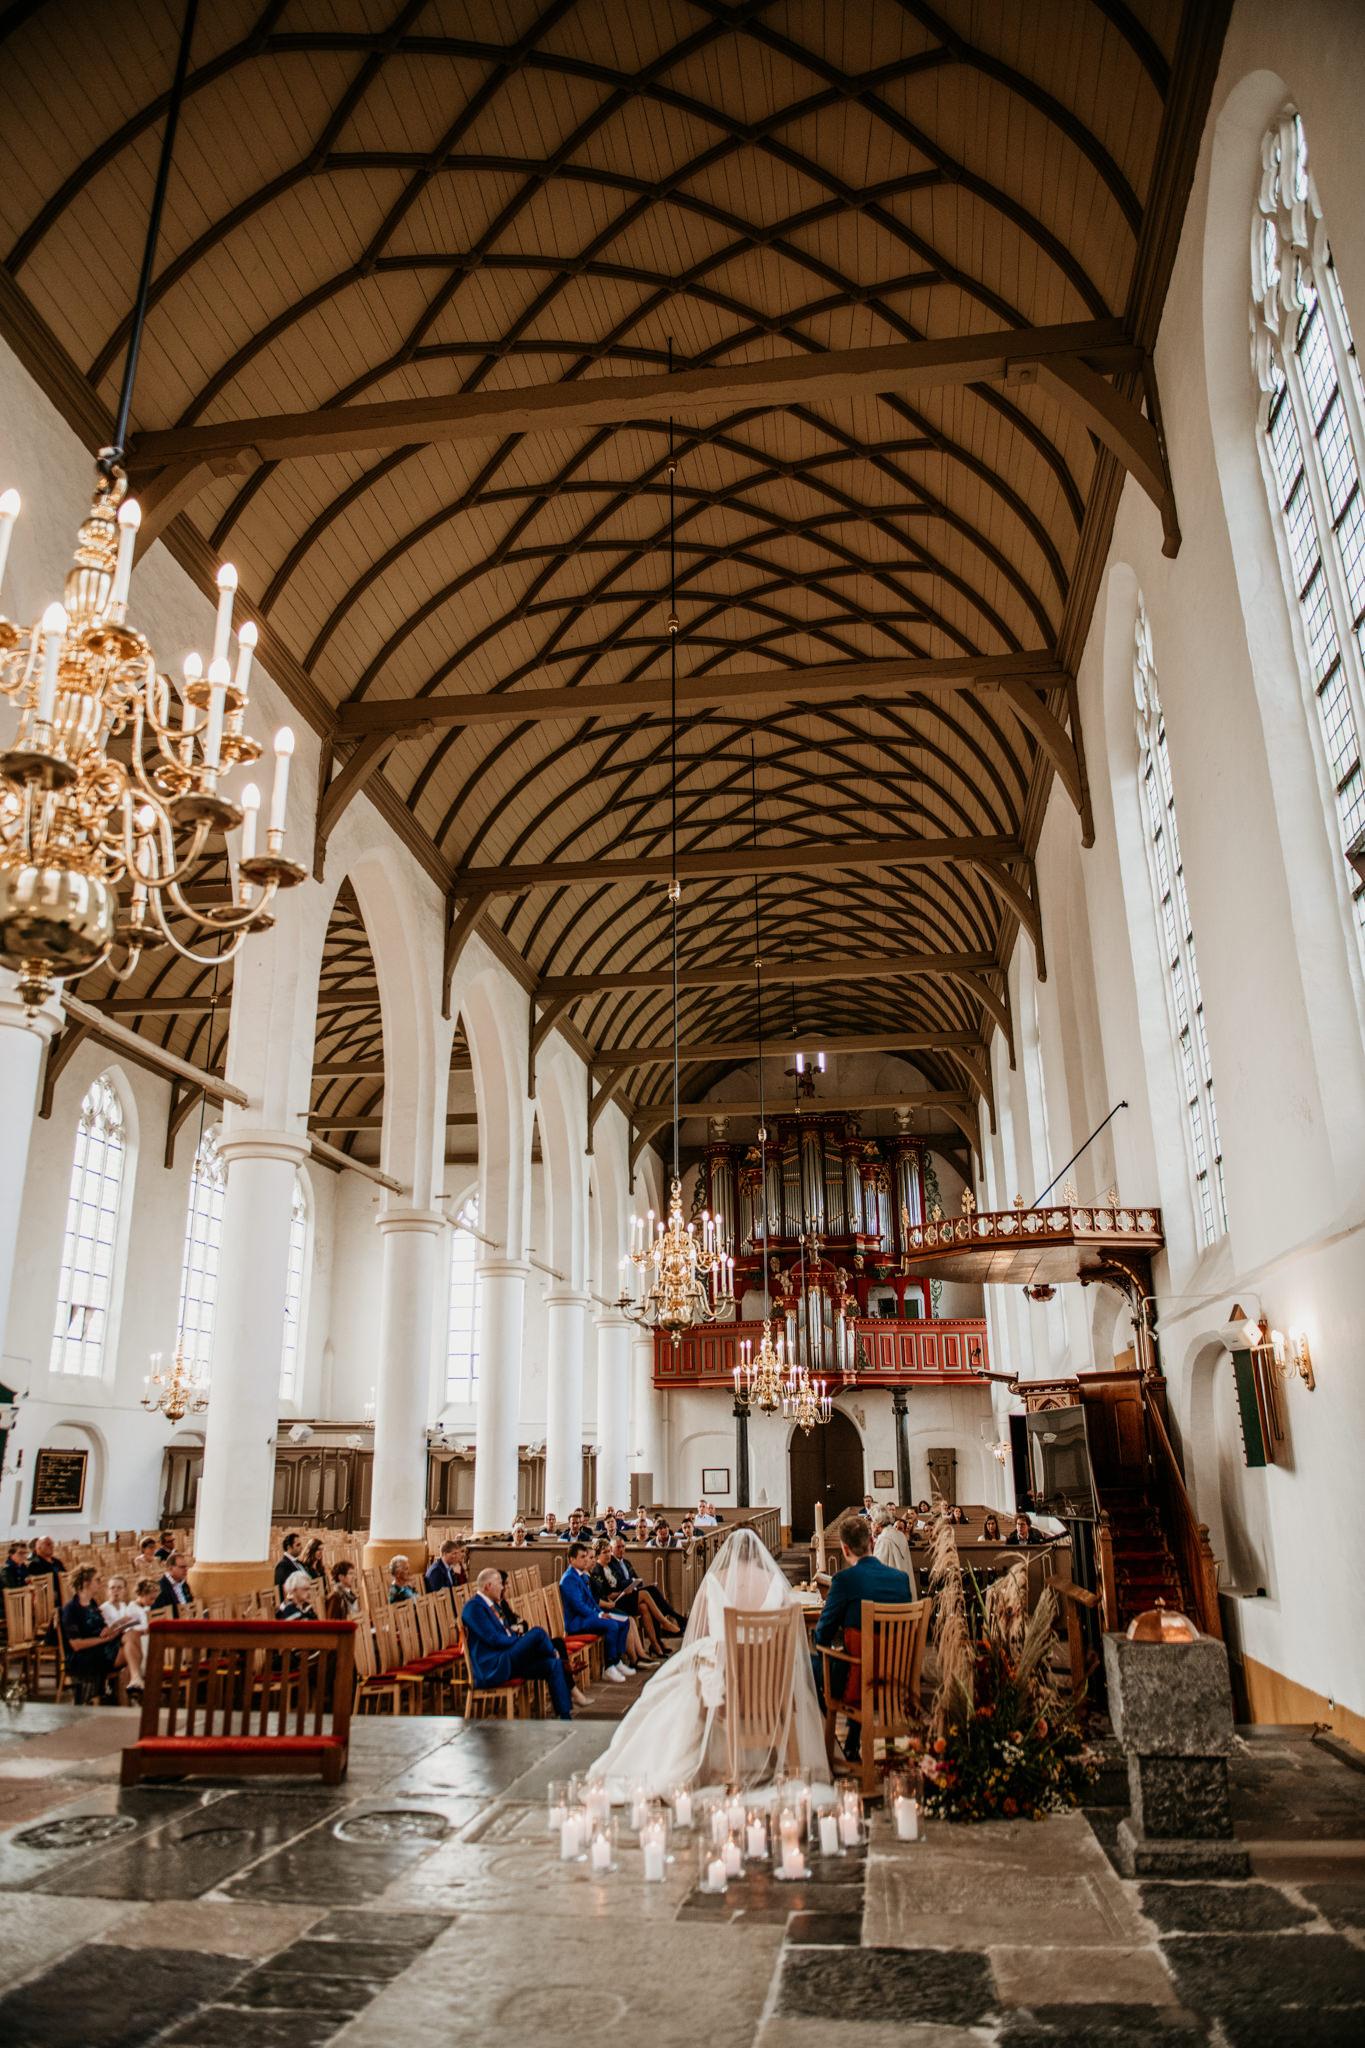 Trouwen in Vollenhove Old Ruitenborgh Oldenhof Grote kerk